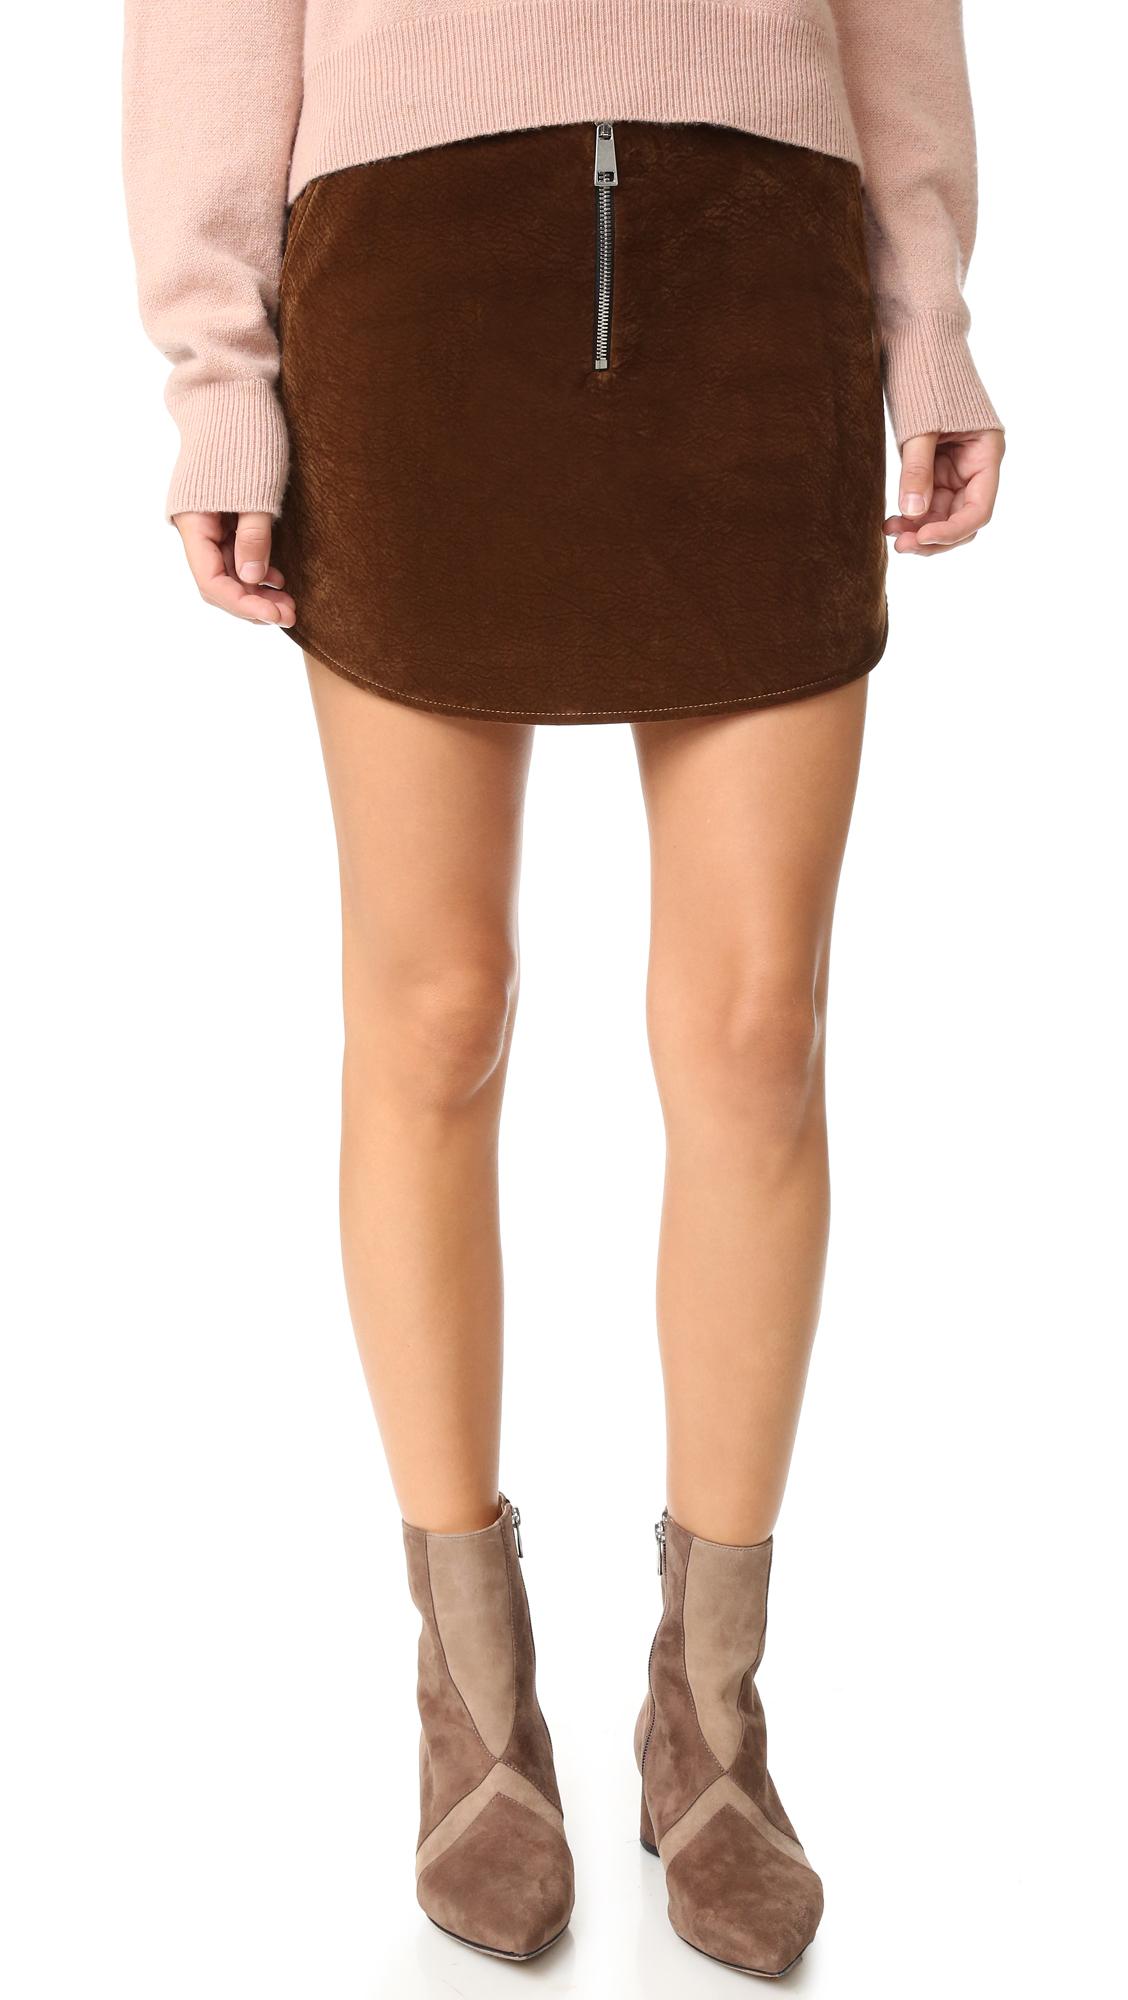 Aeron Velvet Zip Miniskirt - Brown at Shopbop